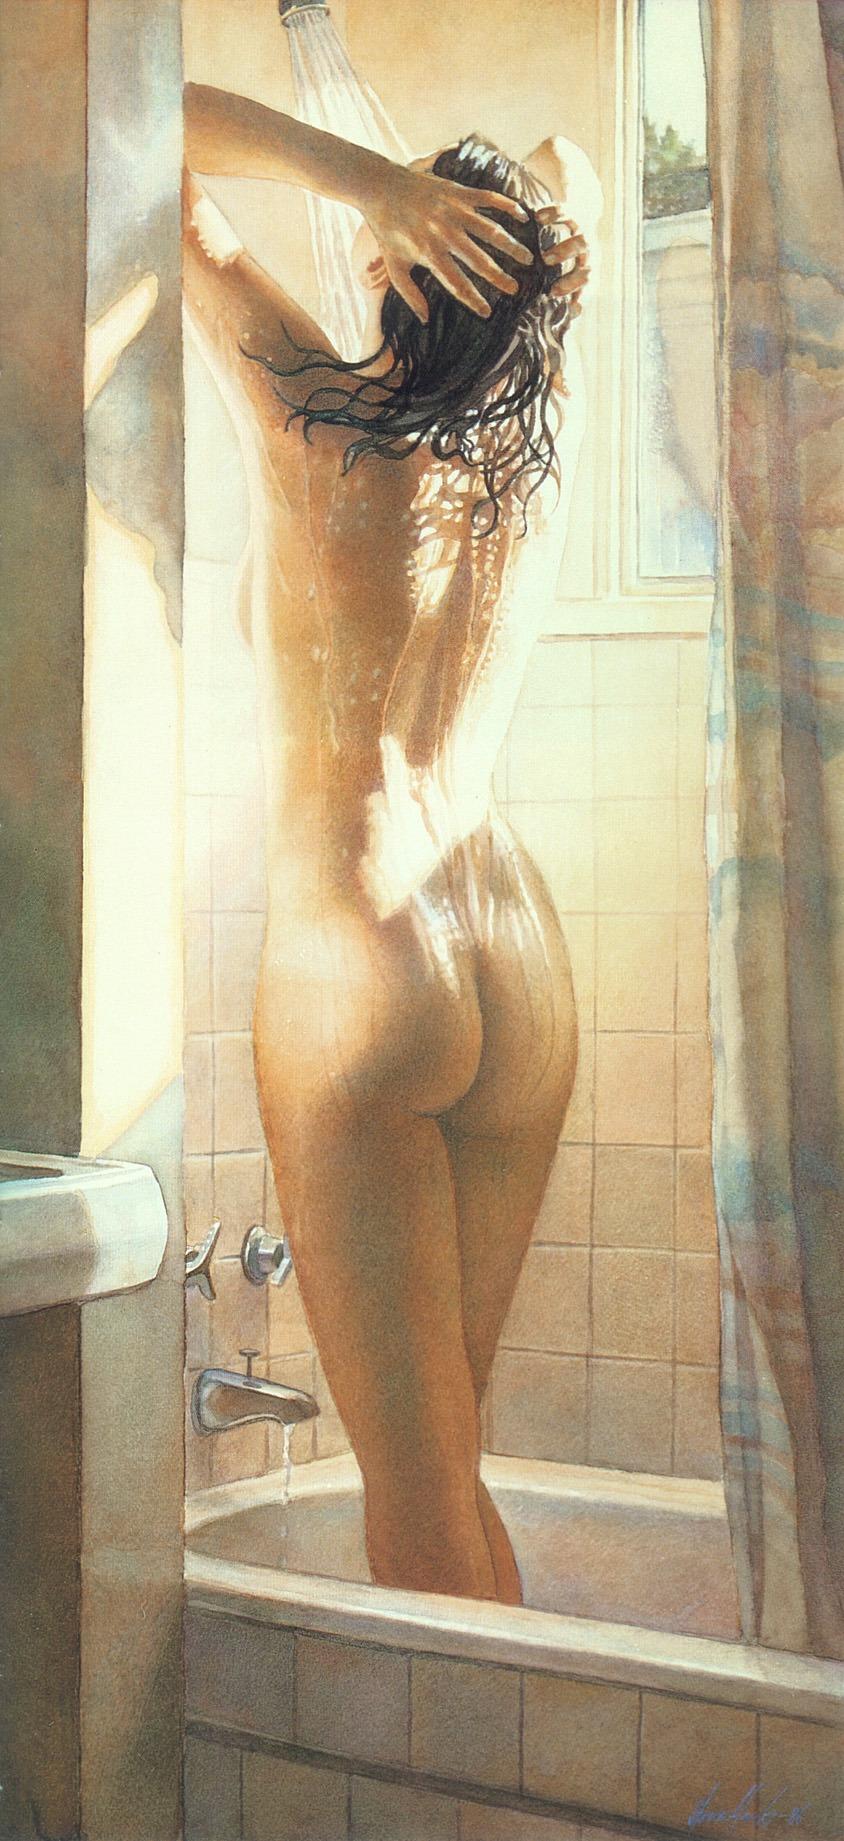 Nude art shower